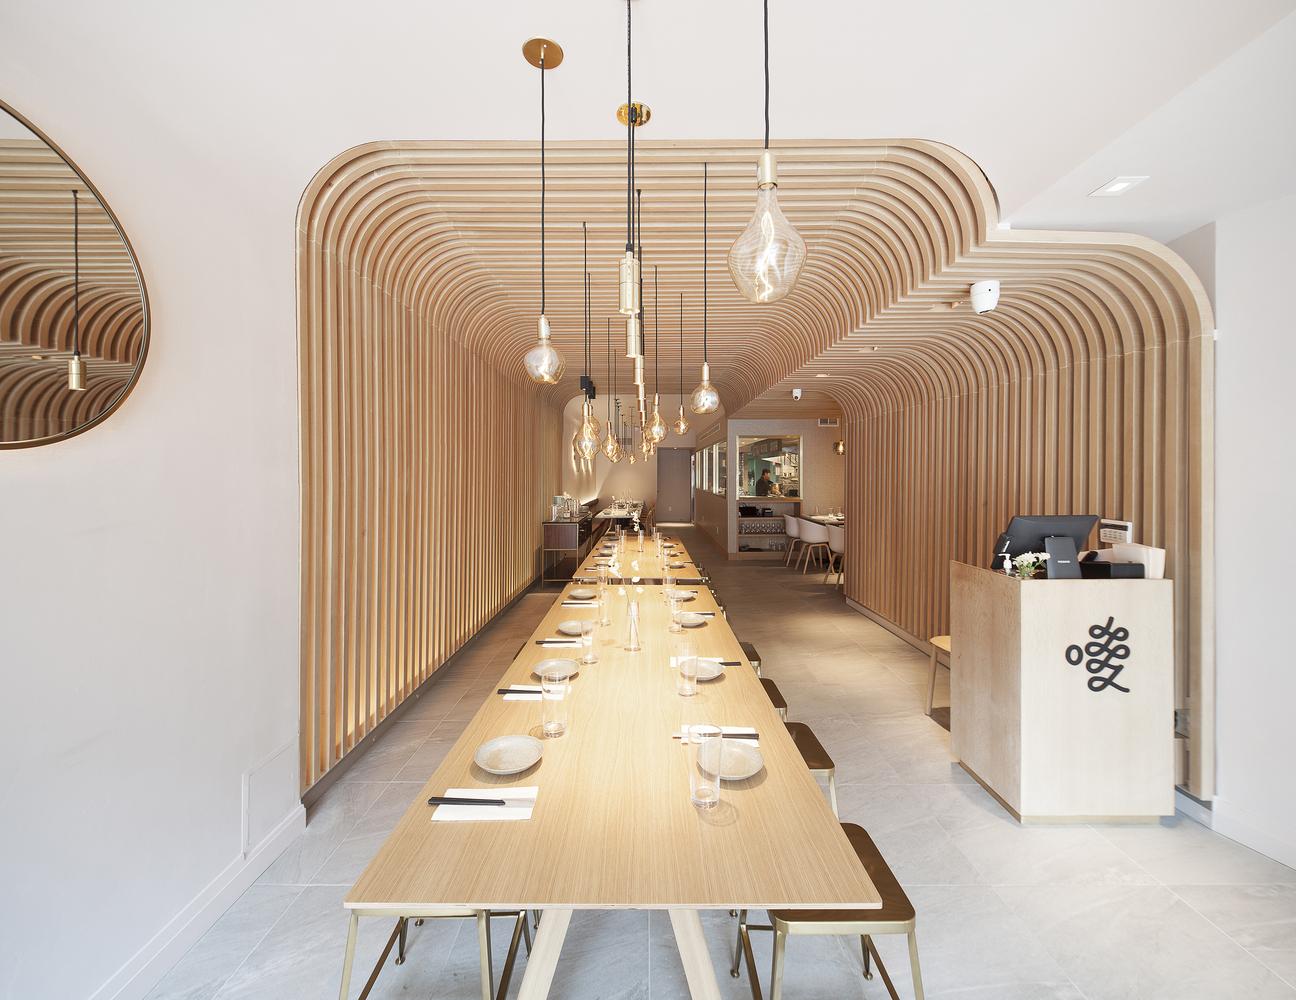 Hunan Slurp New Practice Studio Building Of The Year 2019